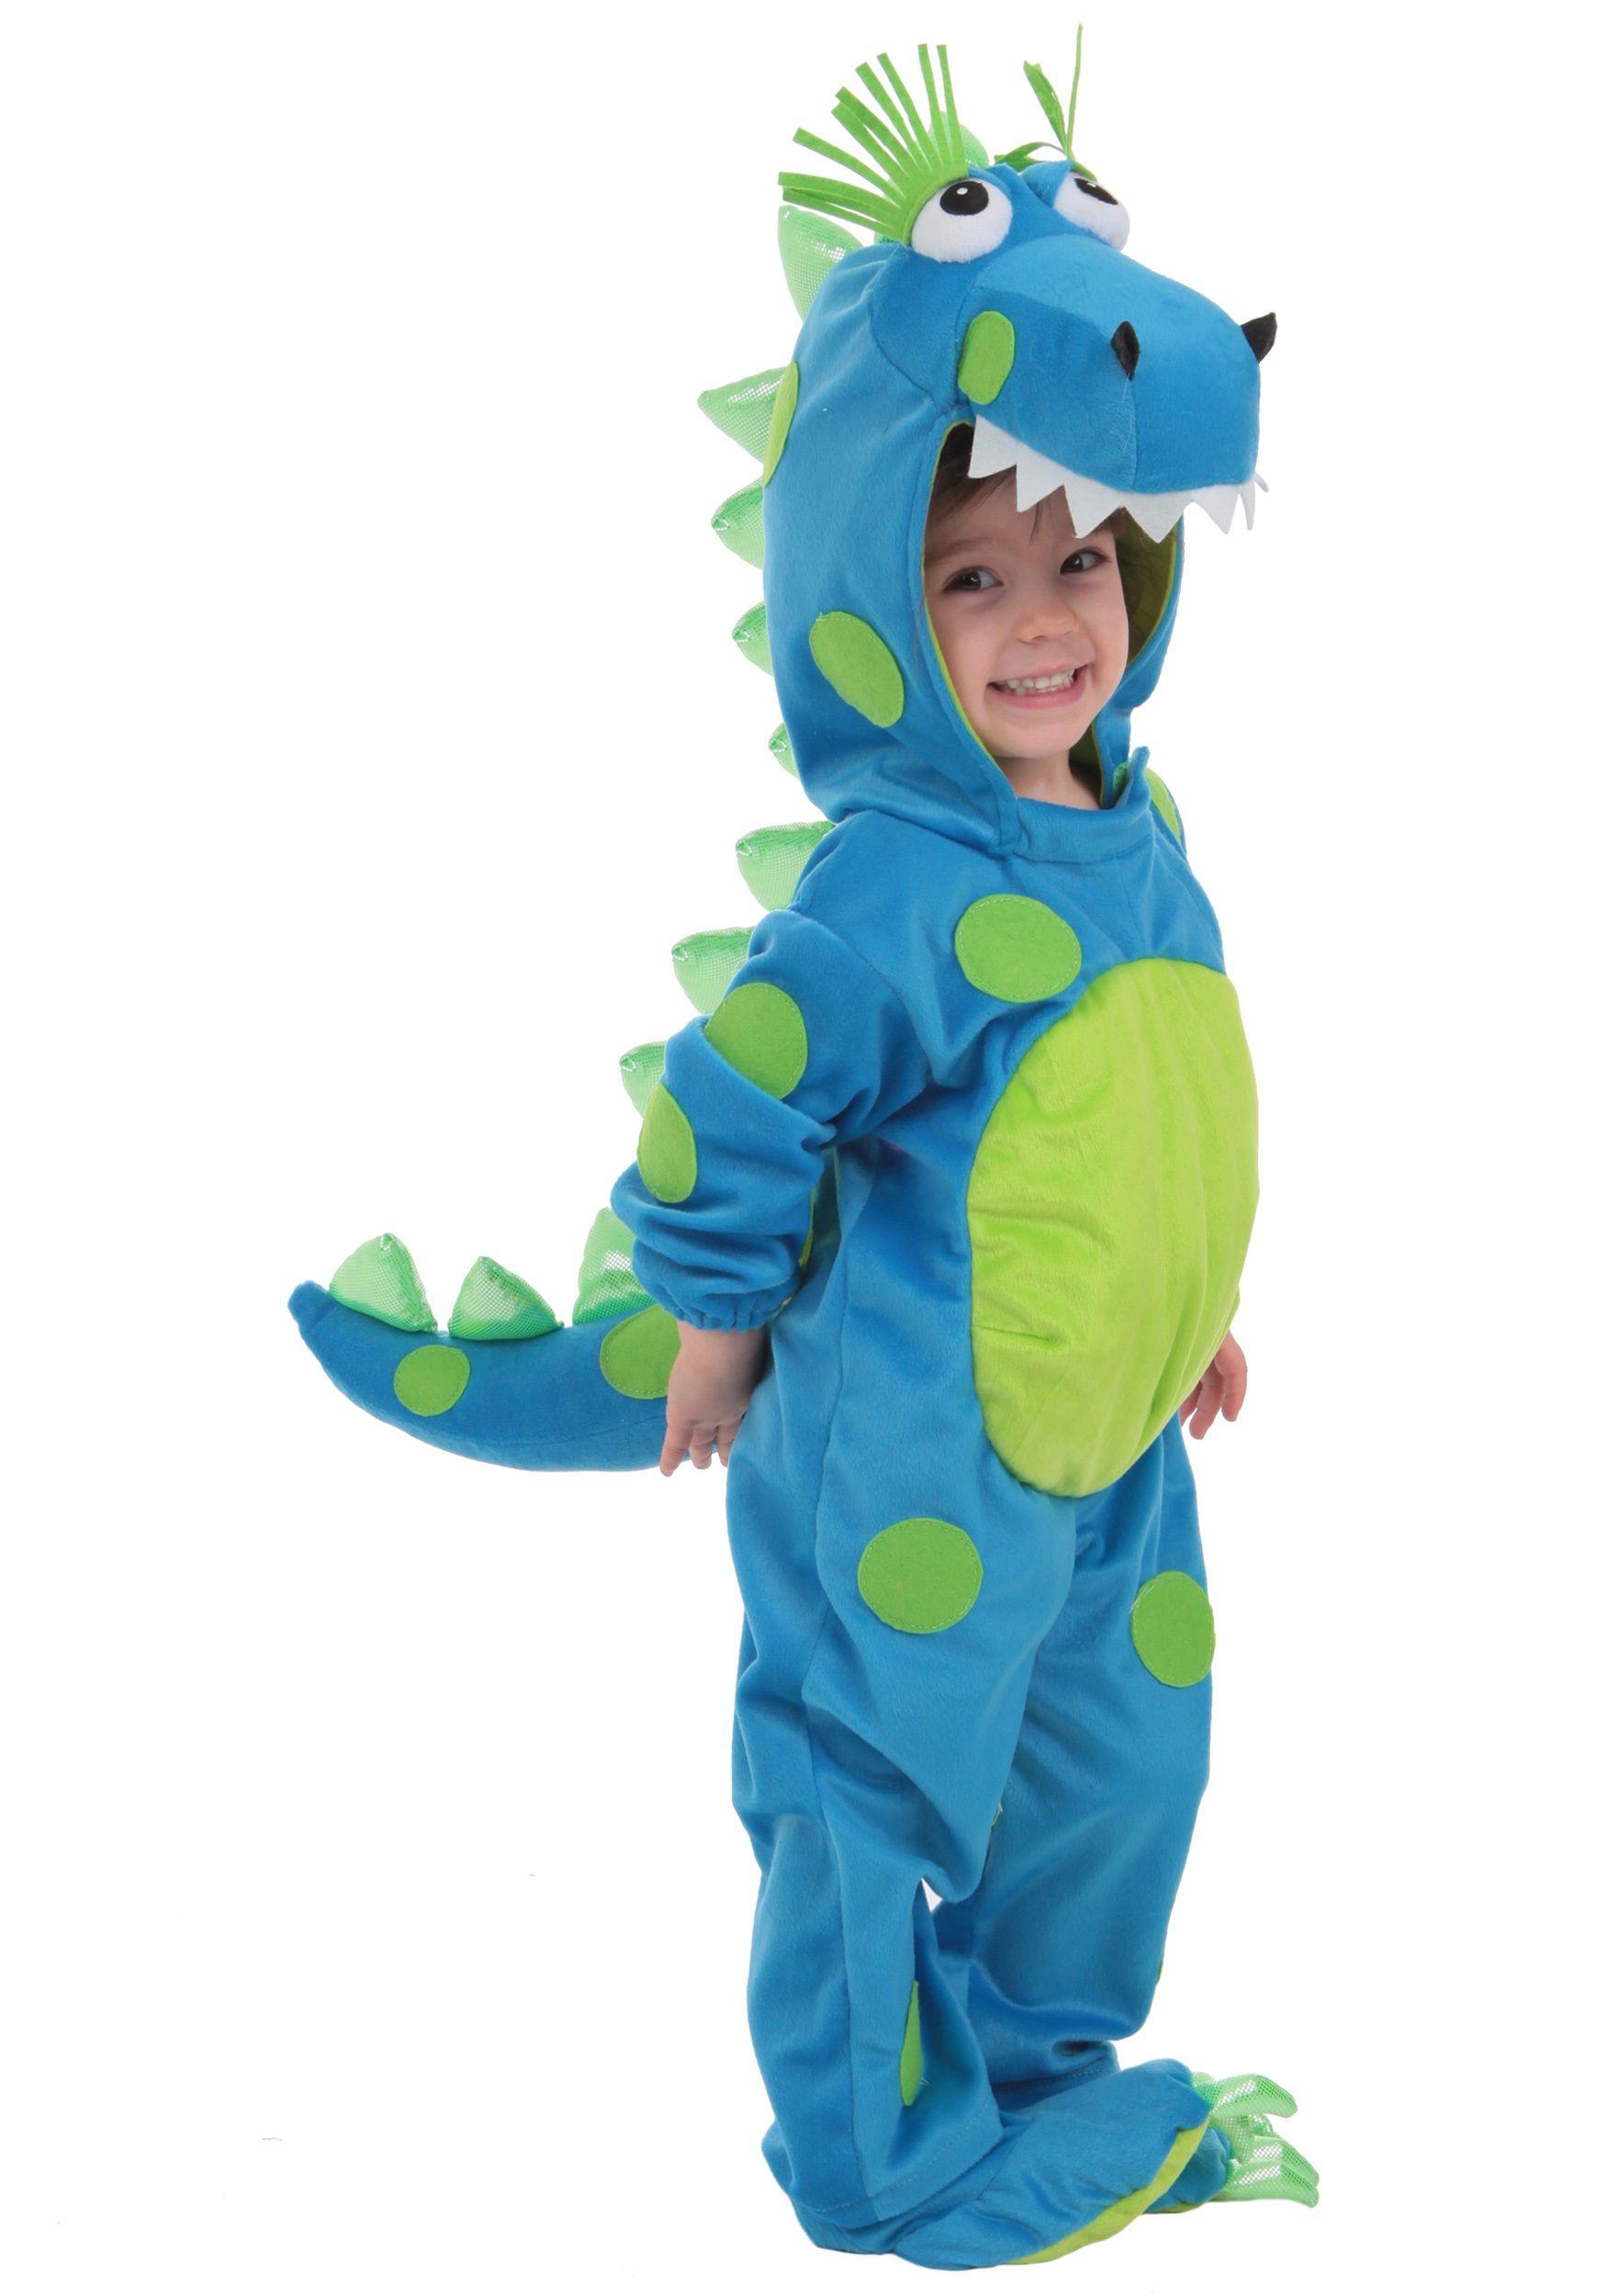 toddler everett the dragon costume - Dragon Toddler Halloween Costume